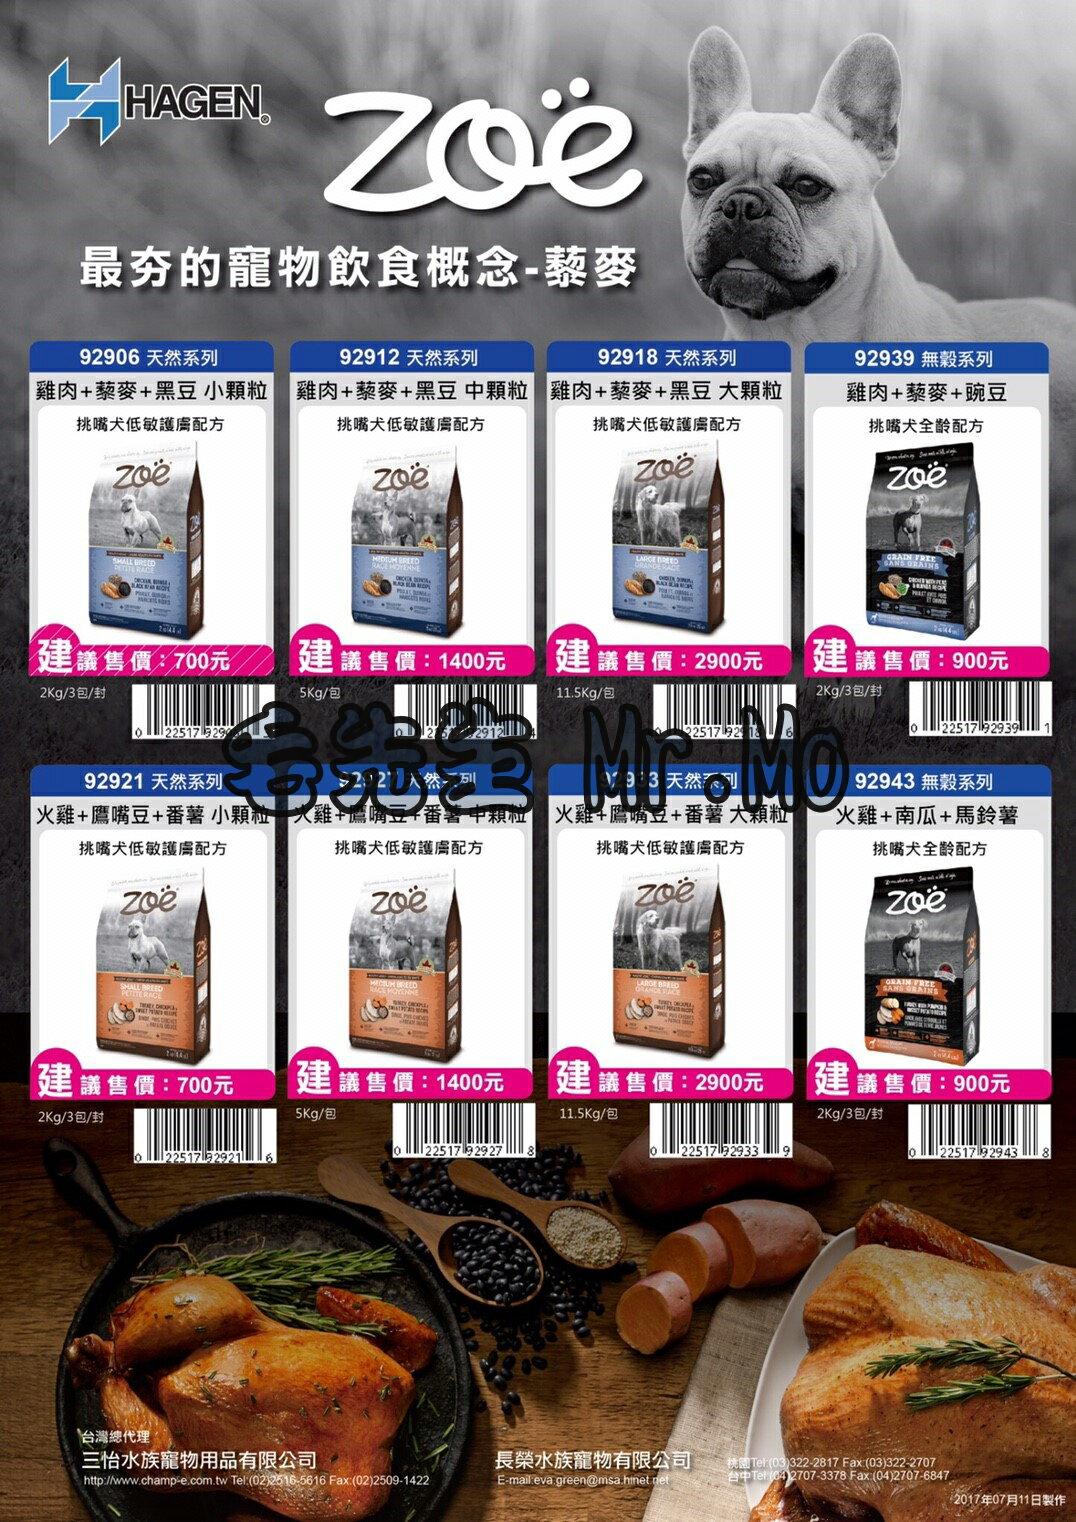 ZOE 狗飼料 犬糧 2Kg 雞肉+藜麥+黑豆 小粒#赫根